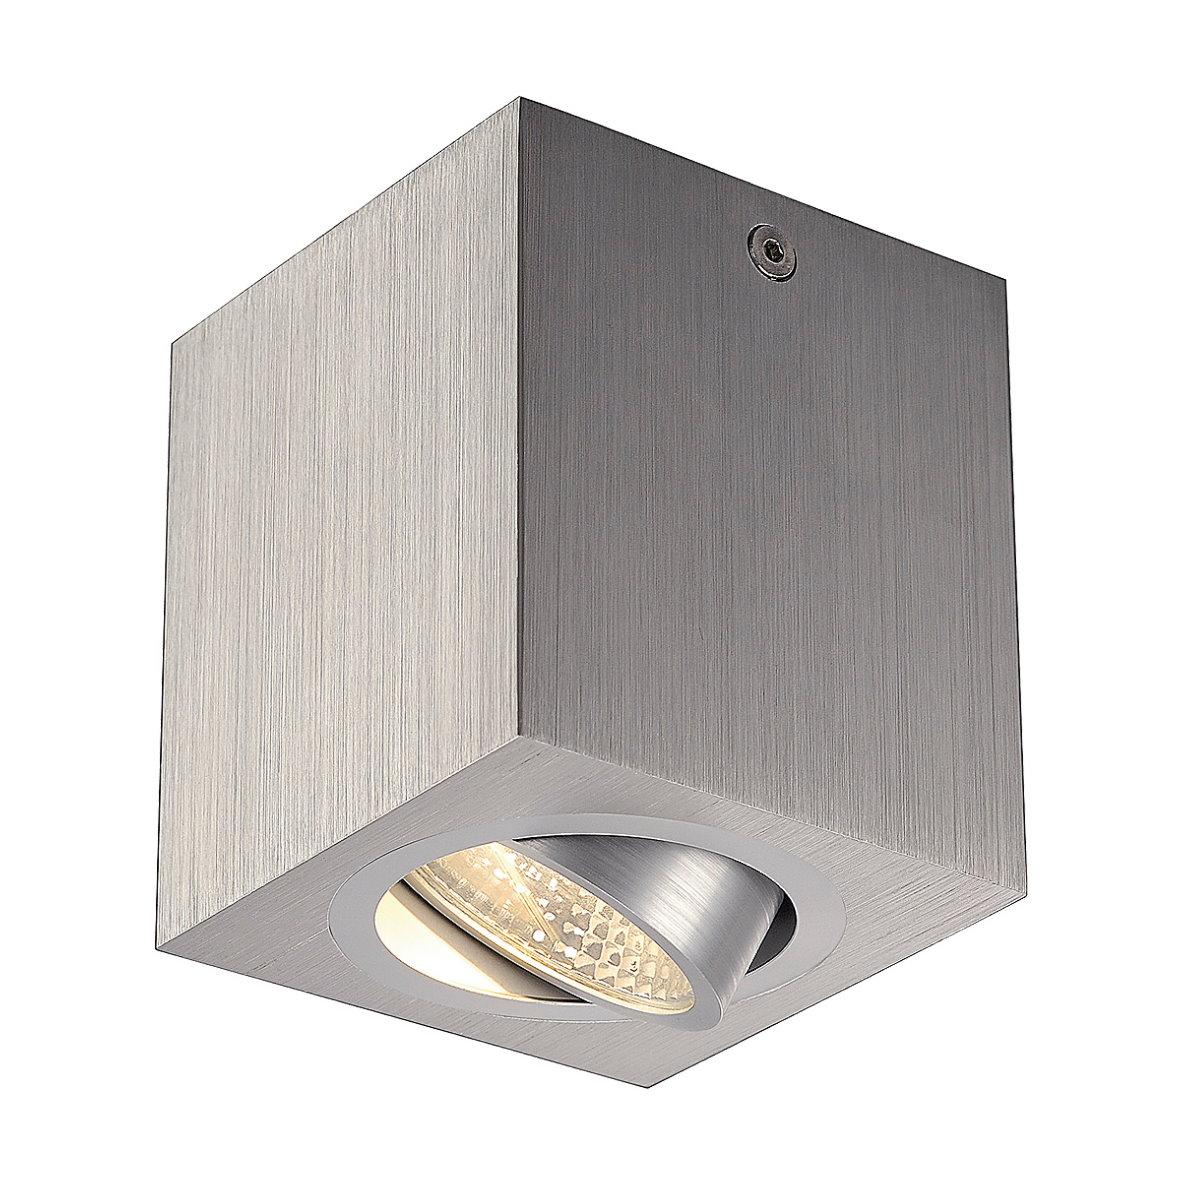 slv led cob aufbauleuchte triledo aufbau leuchte. Black Bedroom Furniture Sets. Home Design Ideas